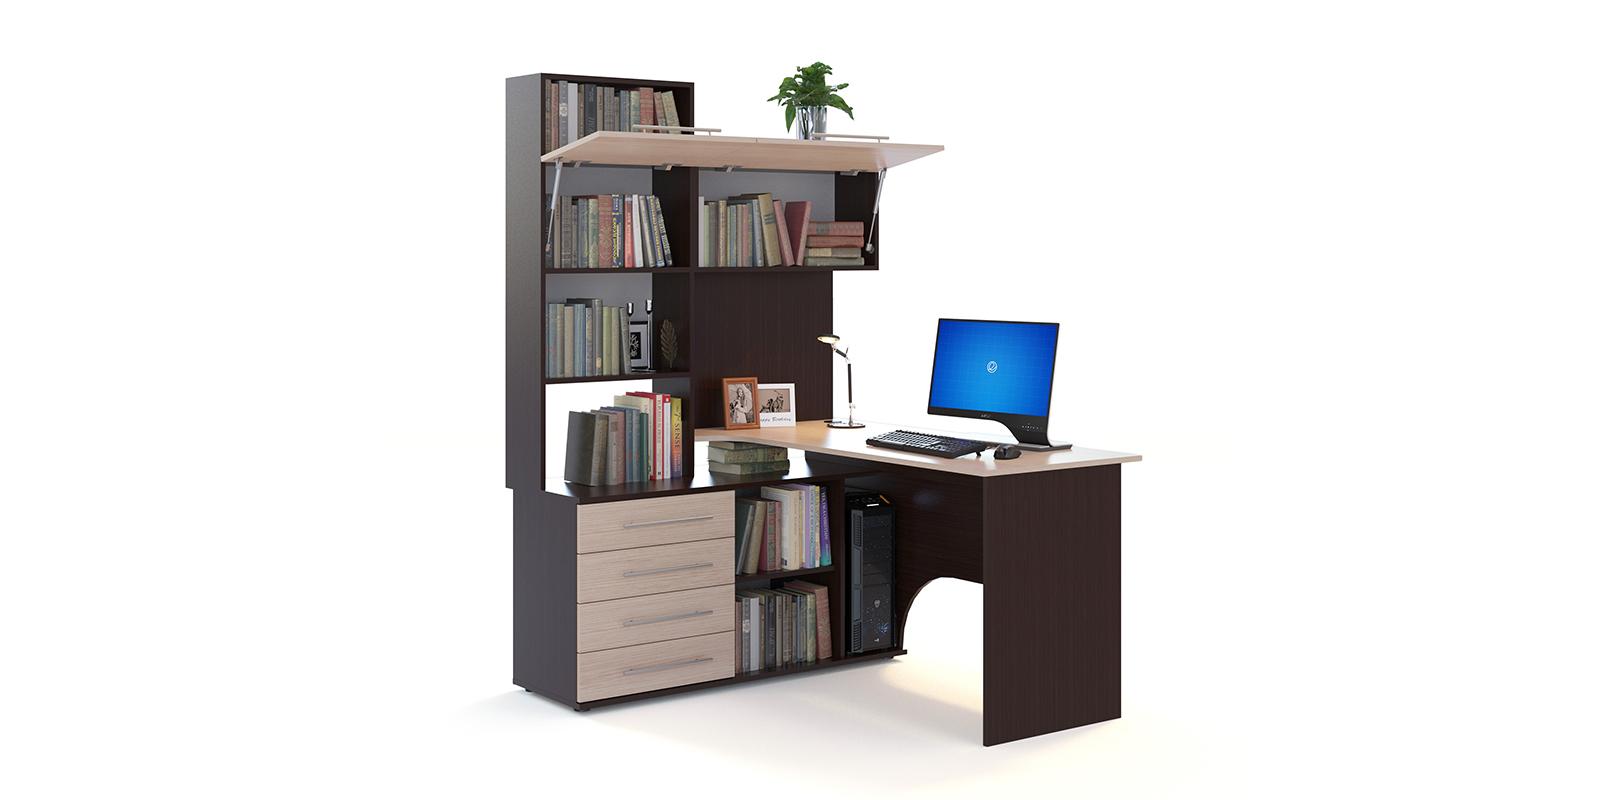 Компьютерный стол homeme - компьютерные и письменные столы -.